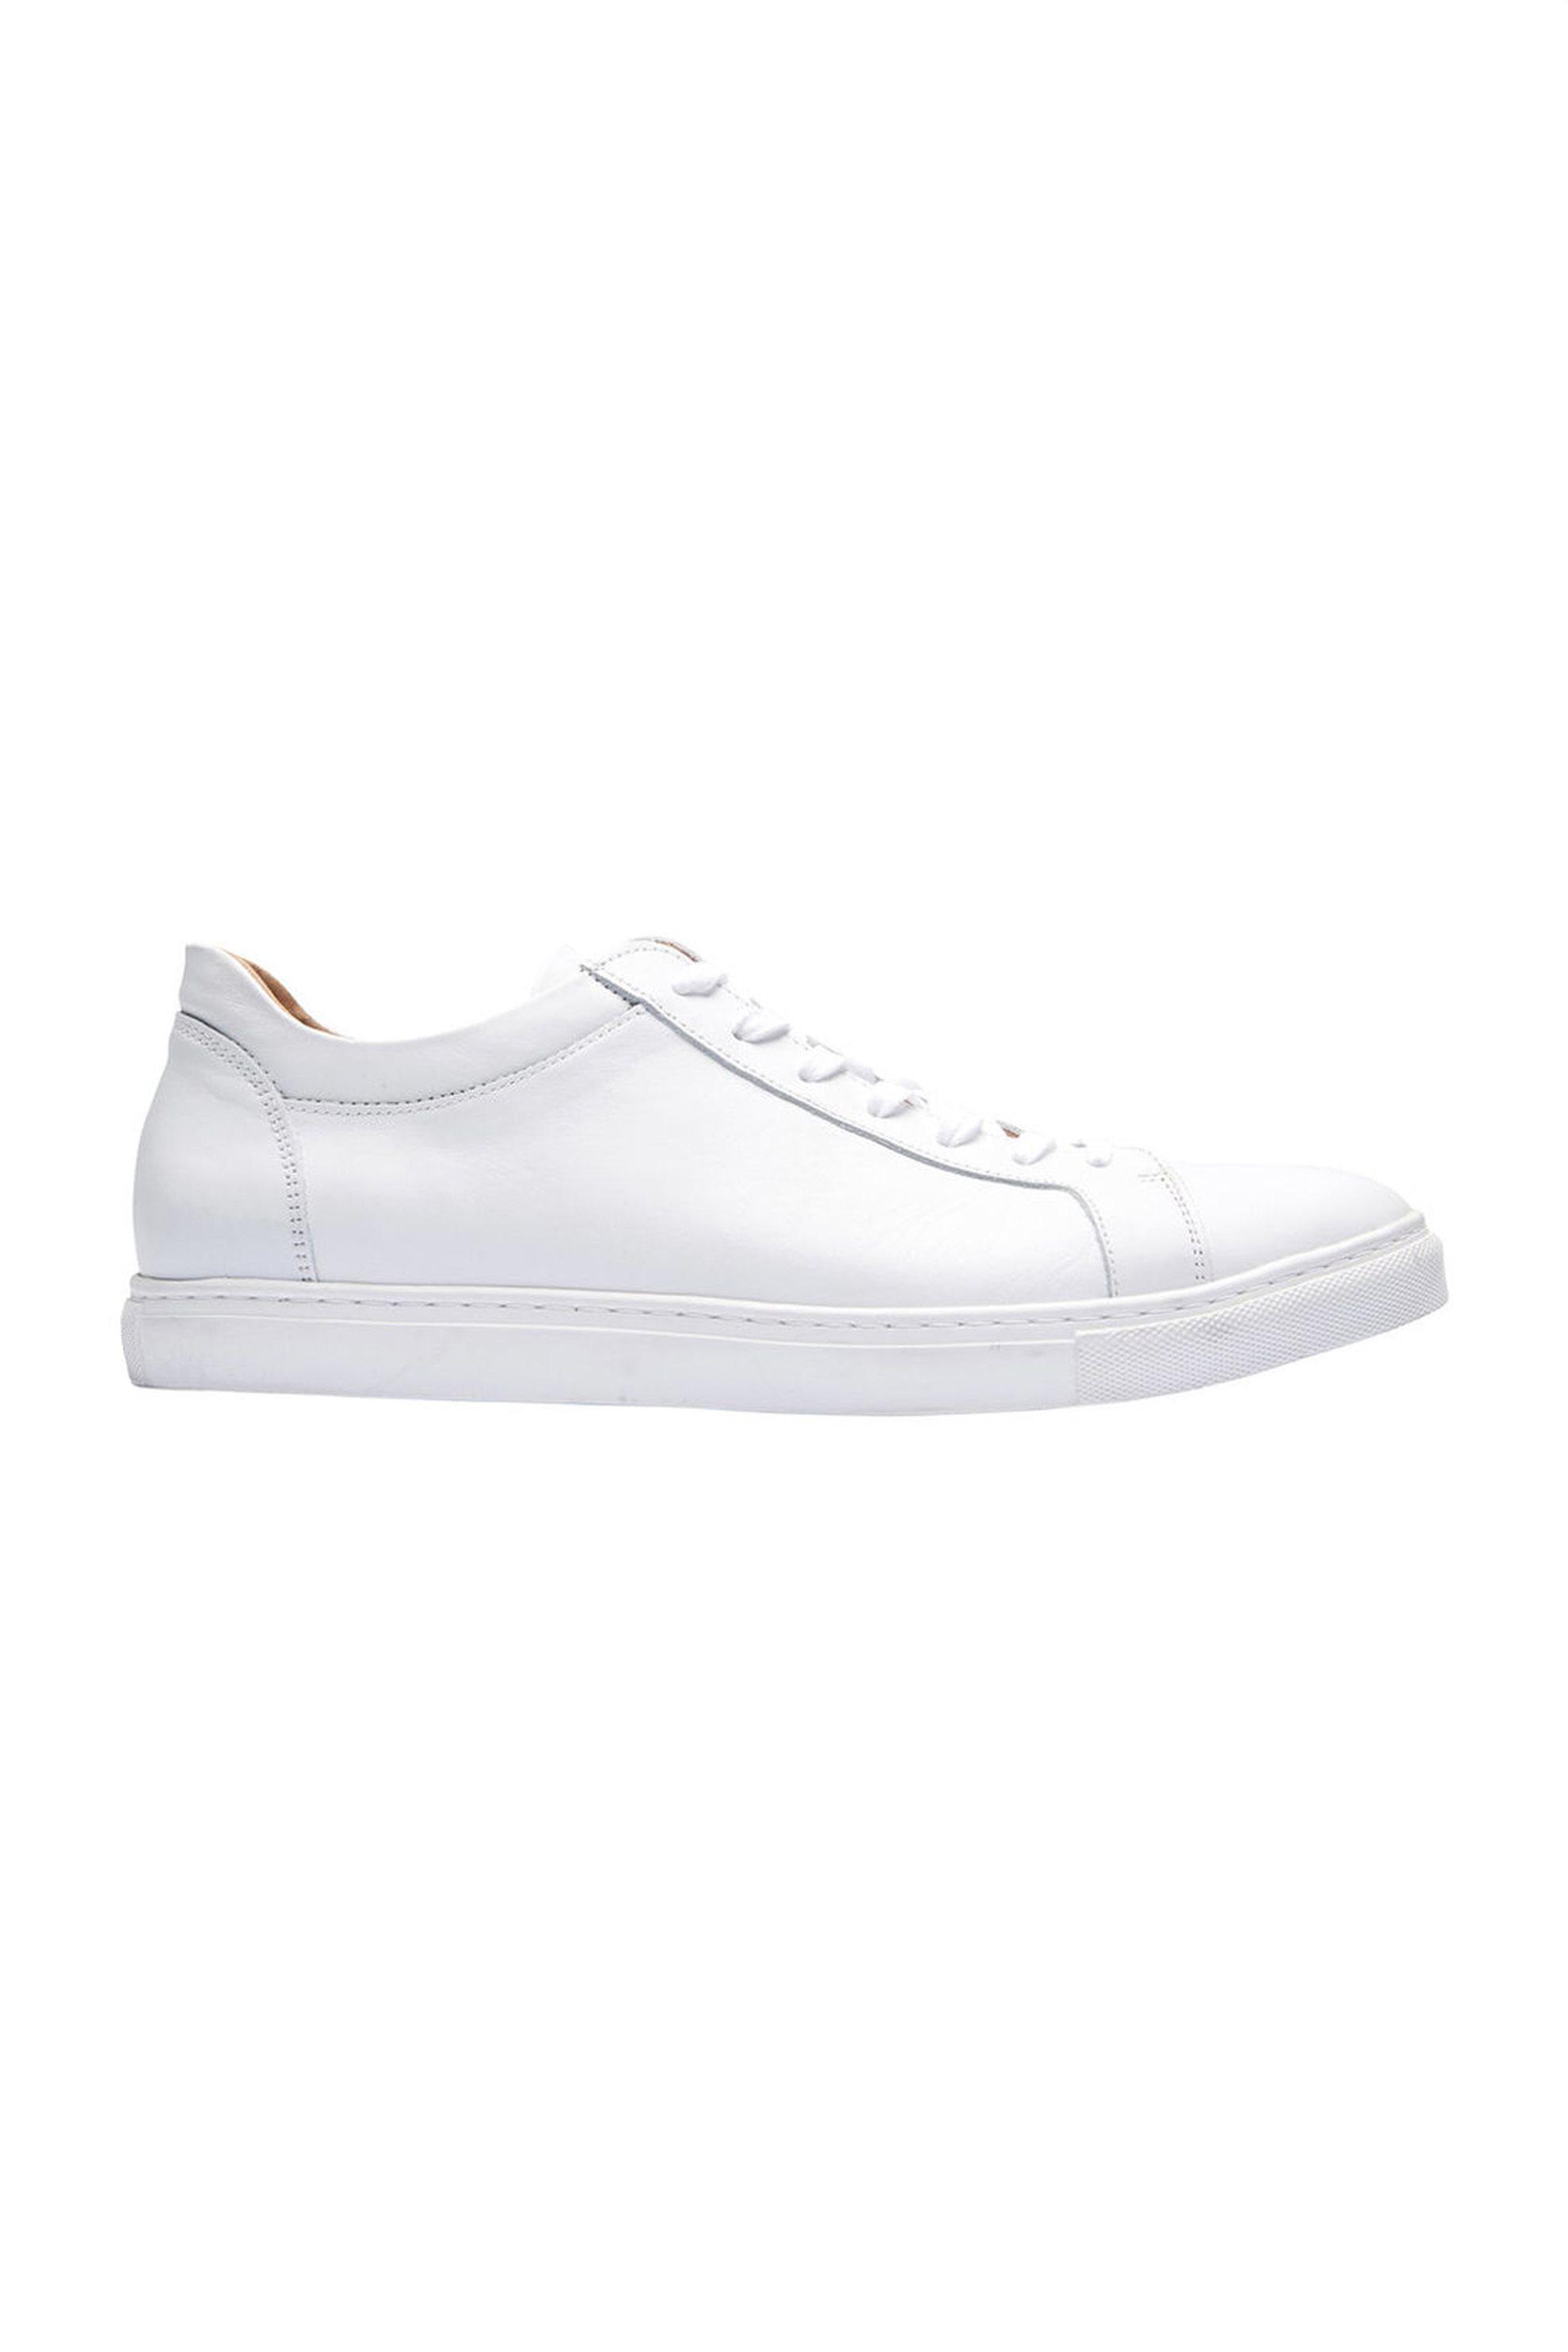 SELECTED ανδρικά sneakers με κορδόνια – 16053768 – Λευκό